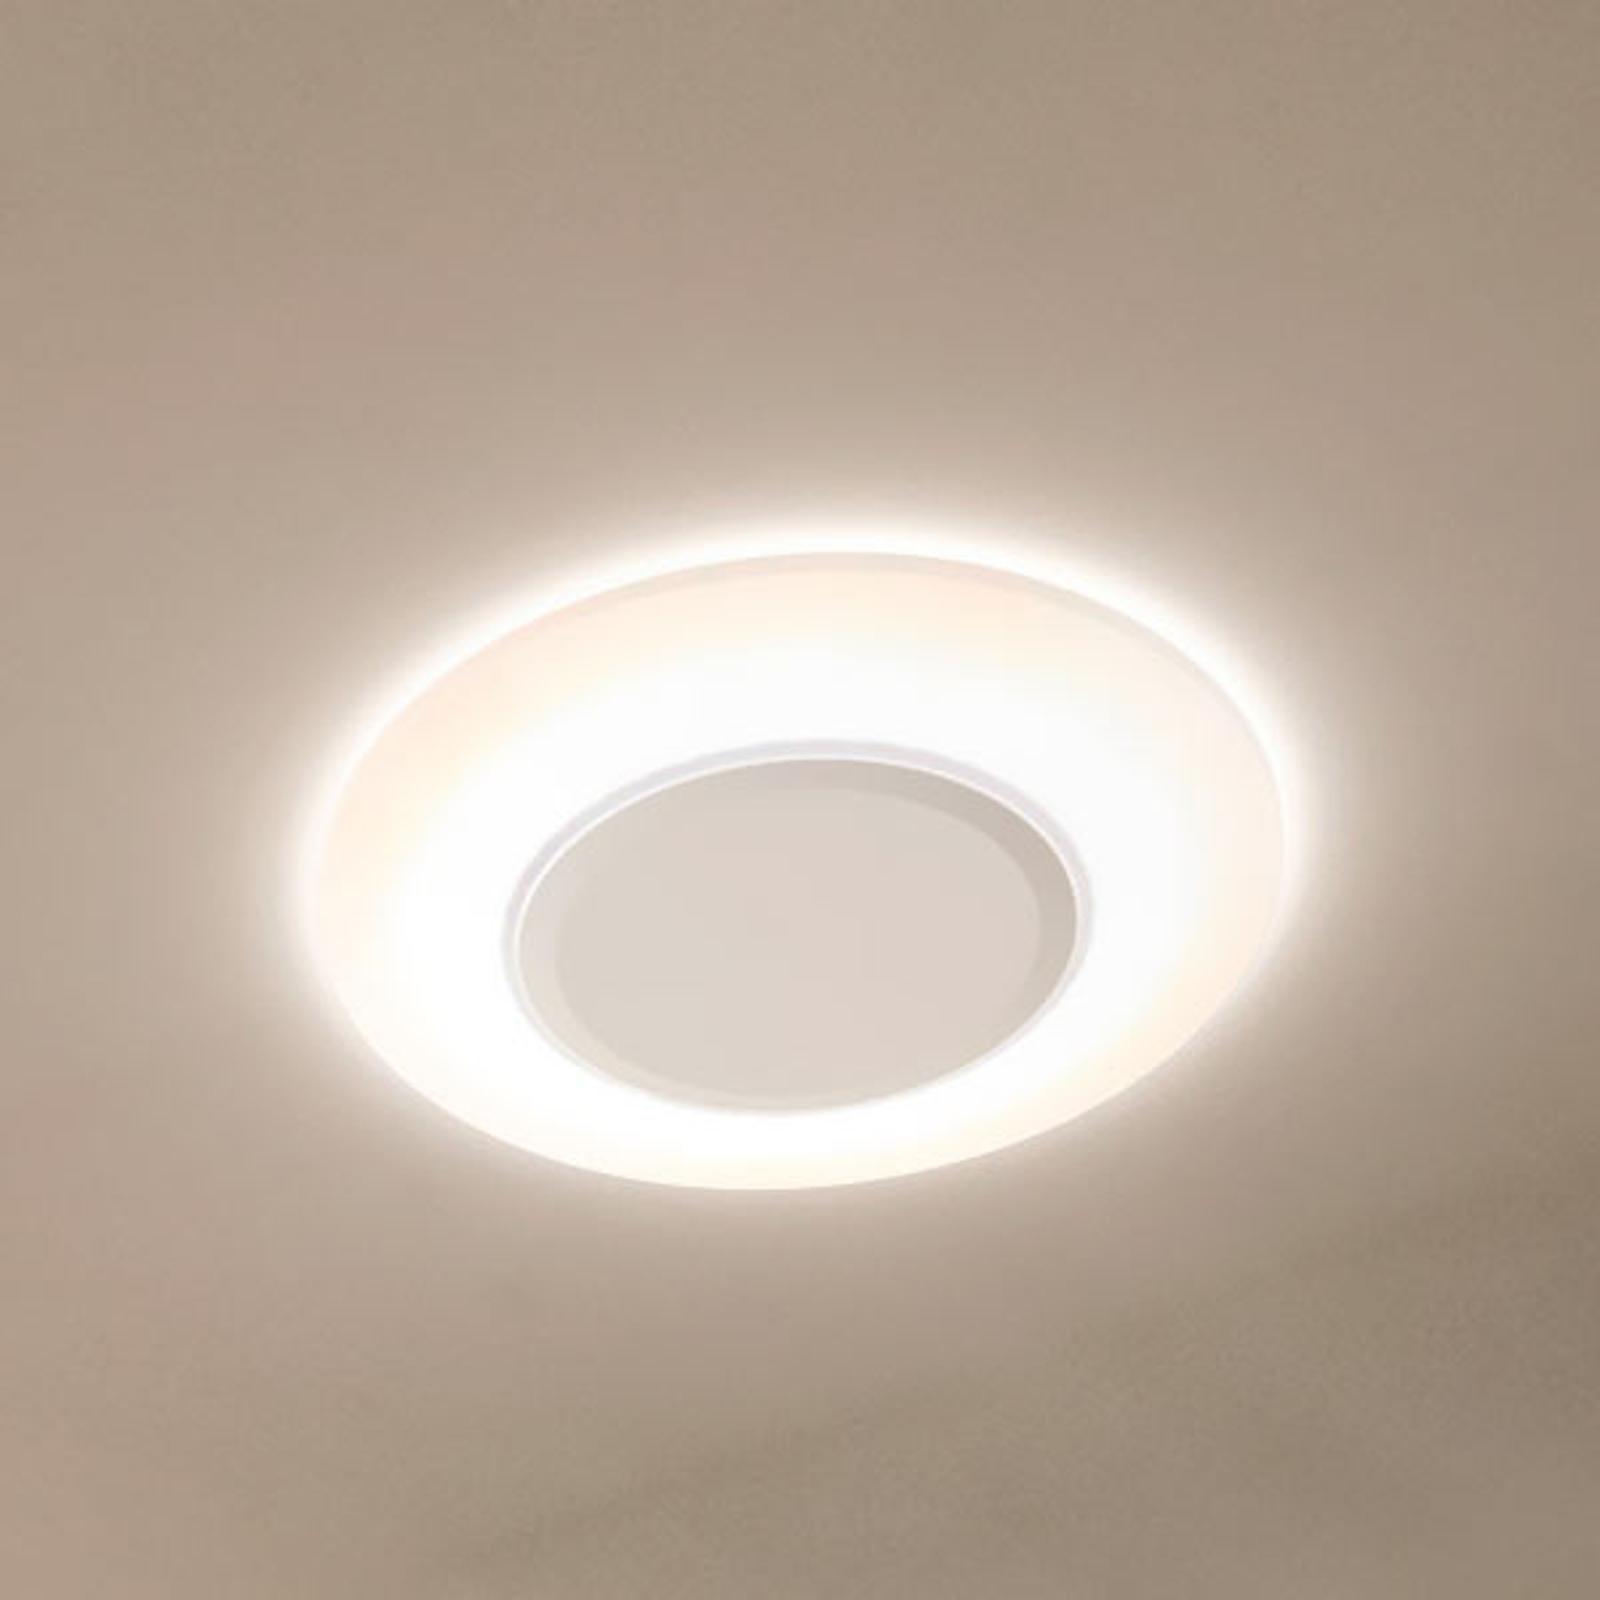 LEDVANCE Ring LED-Deckenleuchte, weiß, 28cm